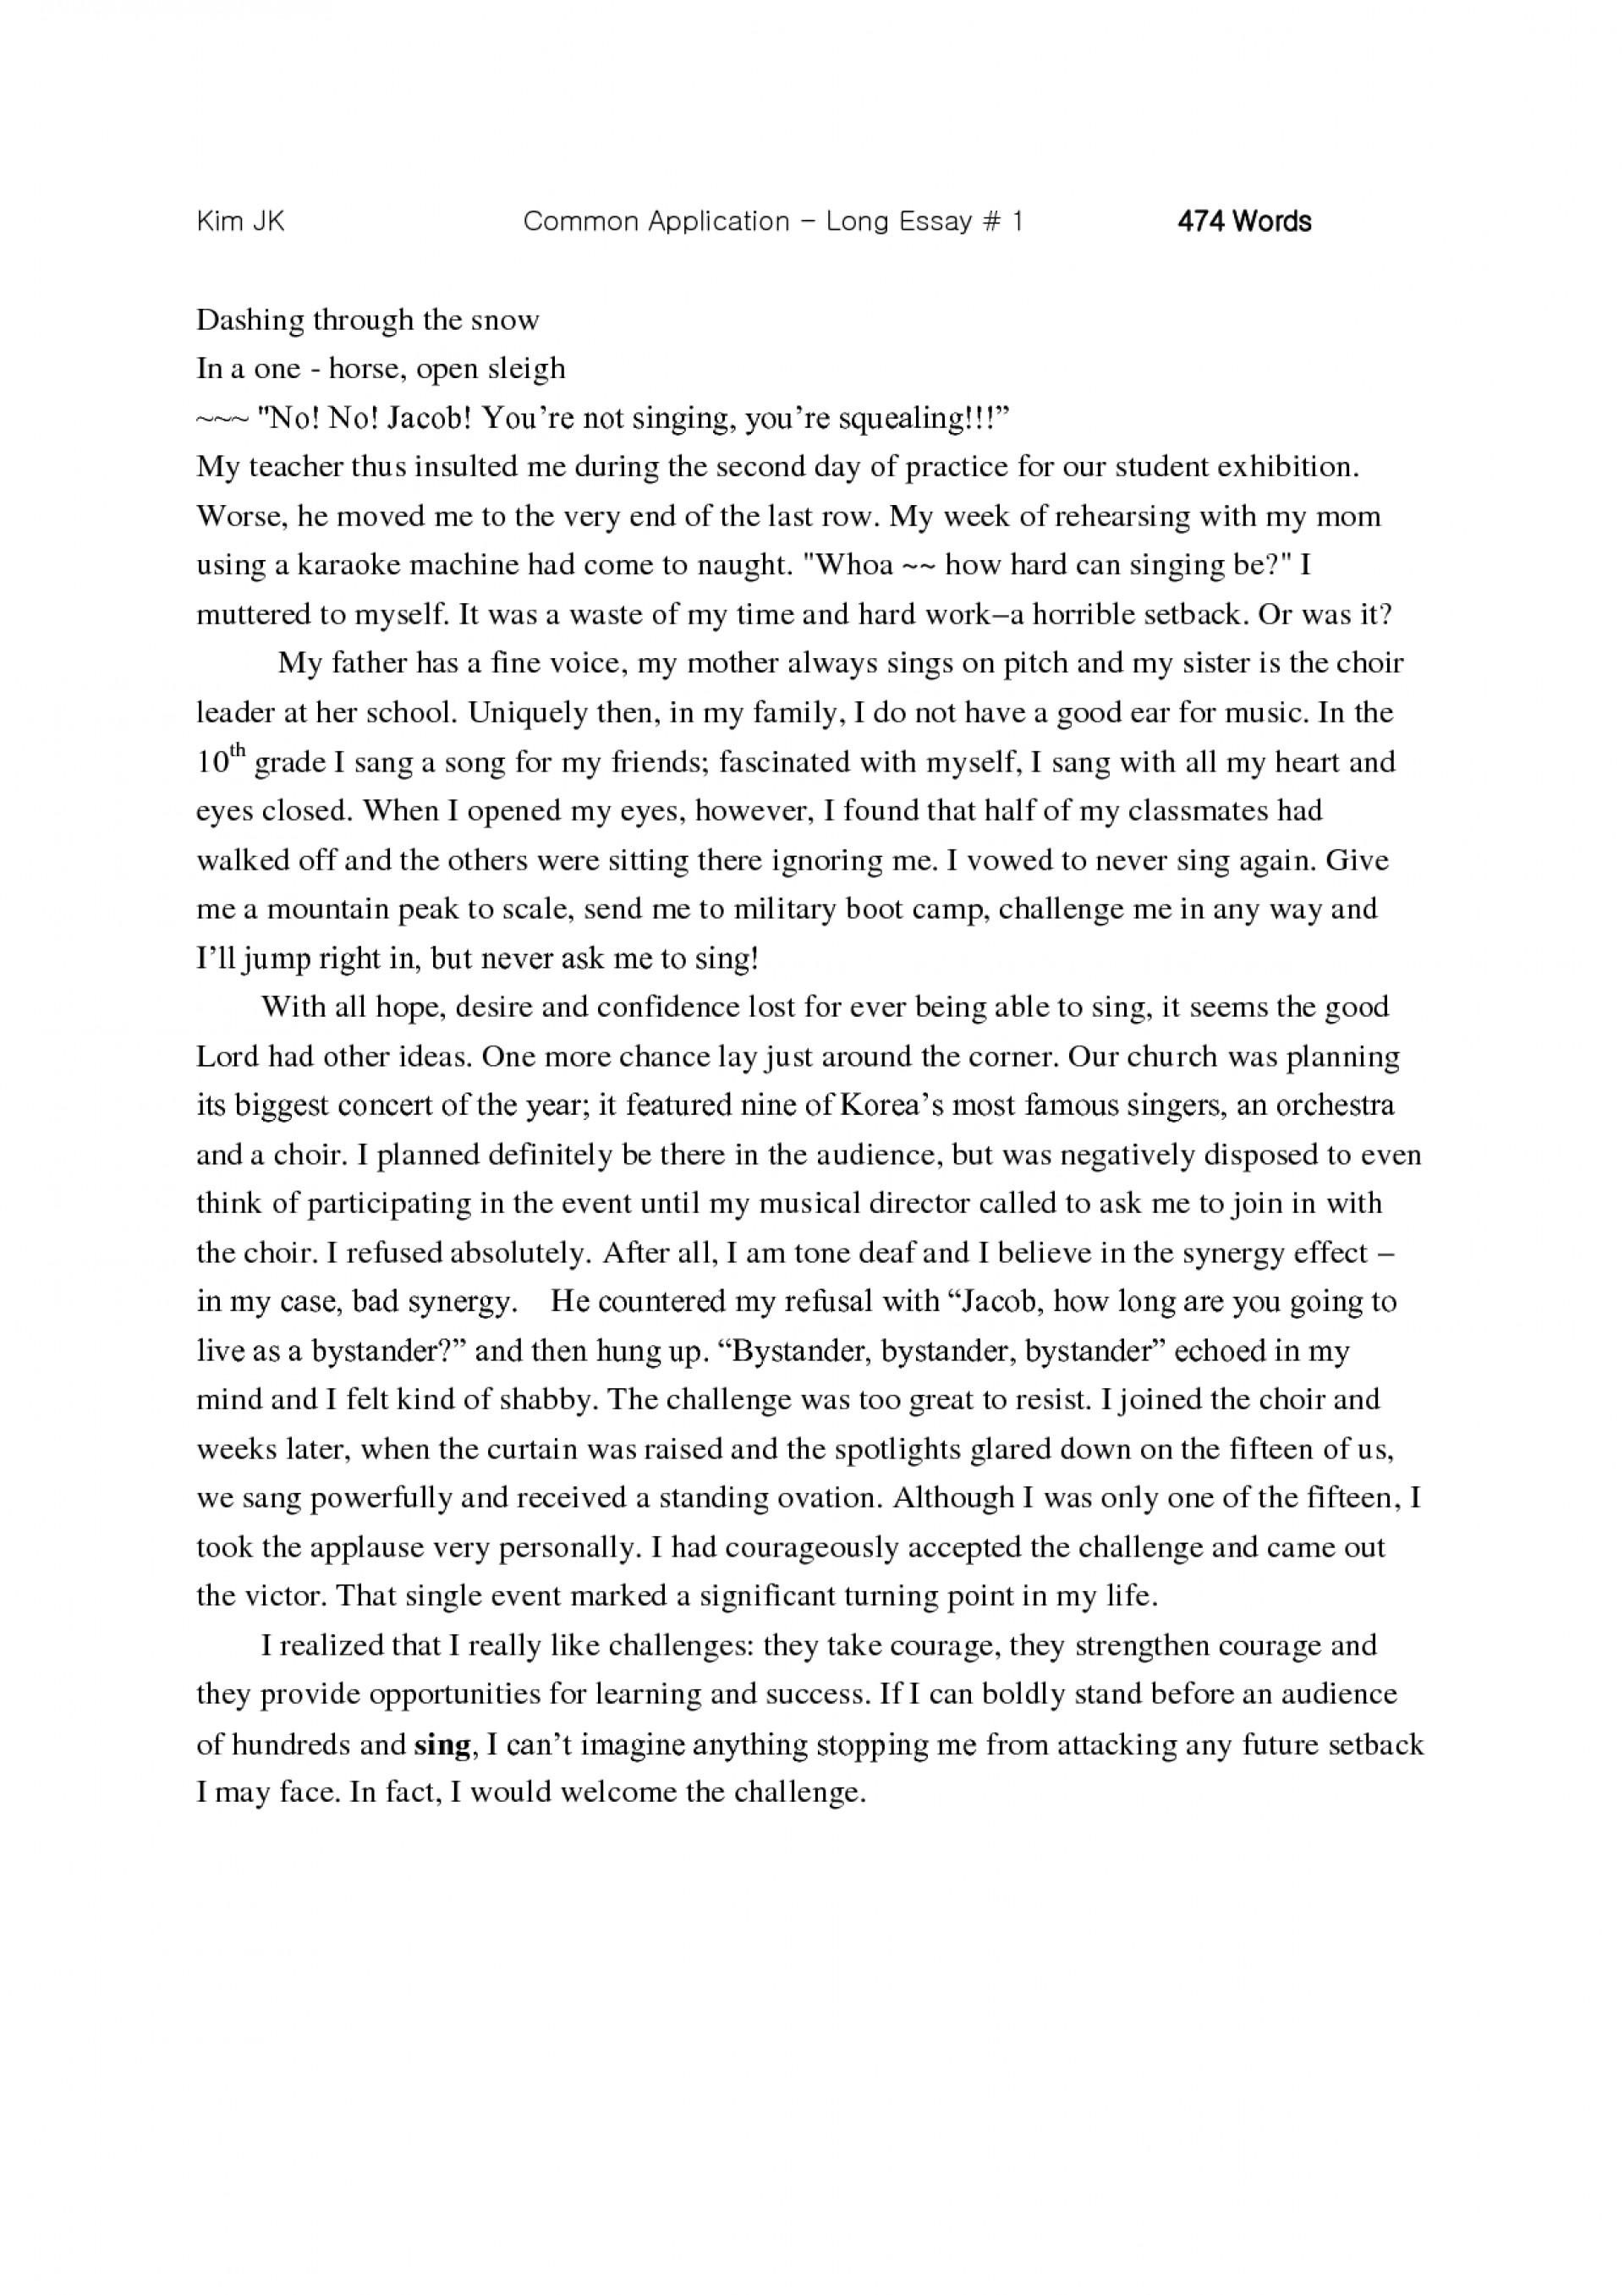 005 good common app essays resume writing application essay help